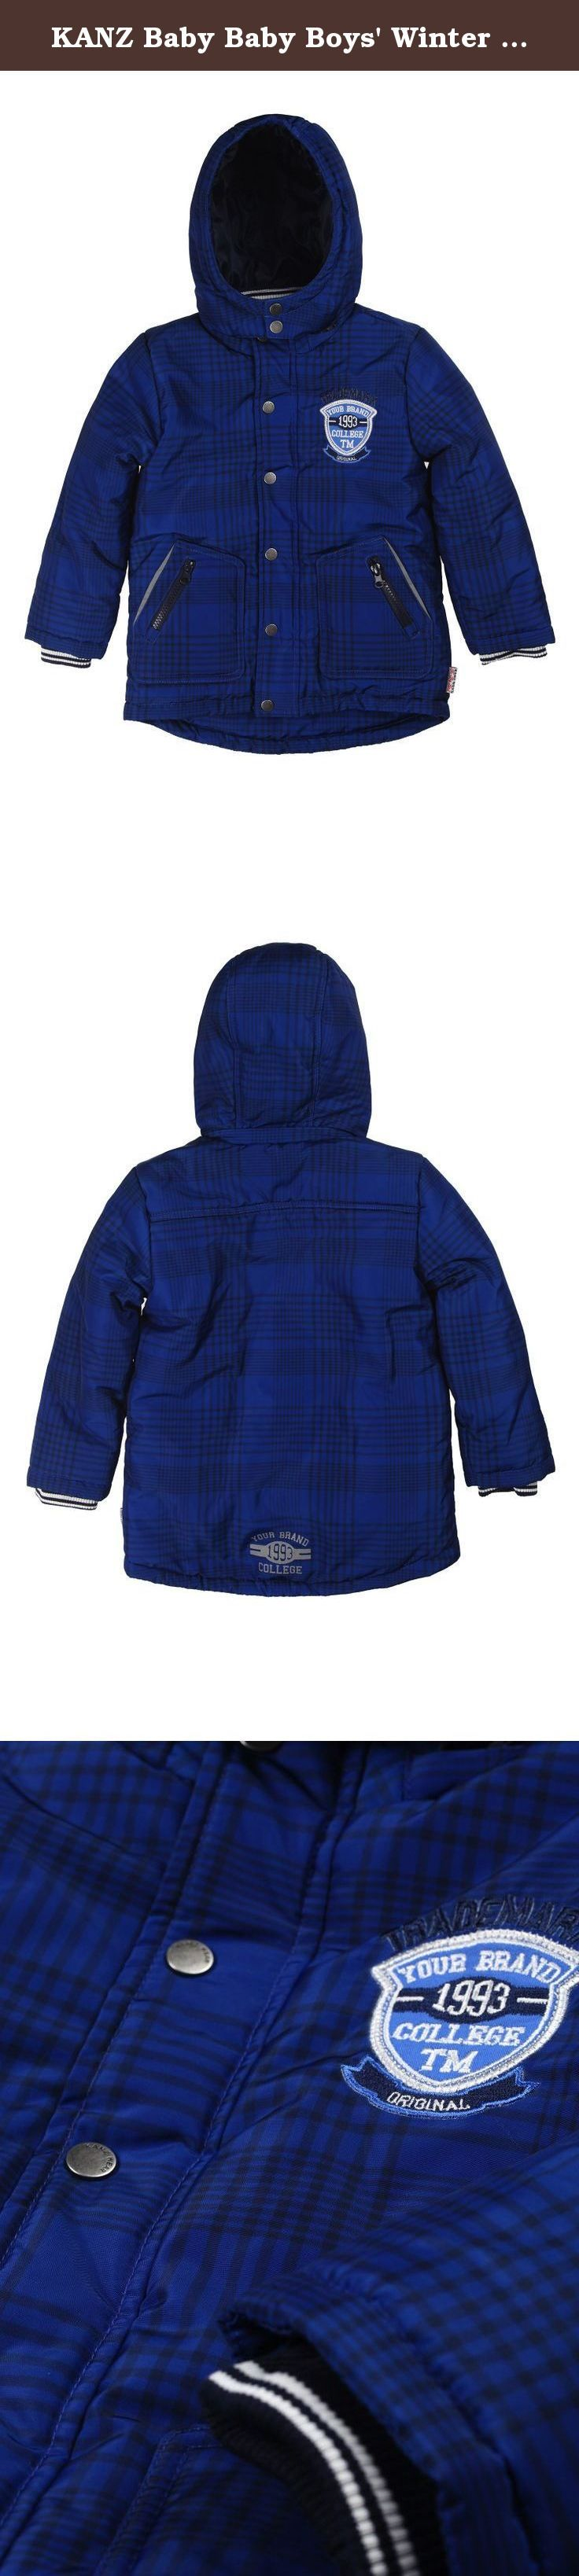 KANZ Baby Baby Boys' Winter Coat, Mazarin Blue, 12 Months. Detachable hooded coat.